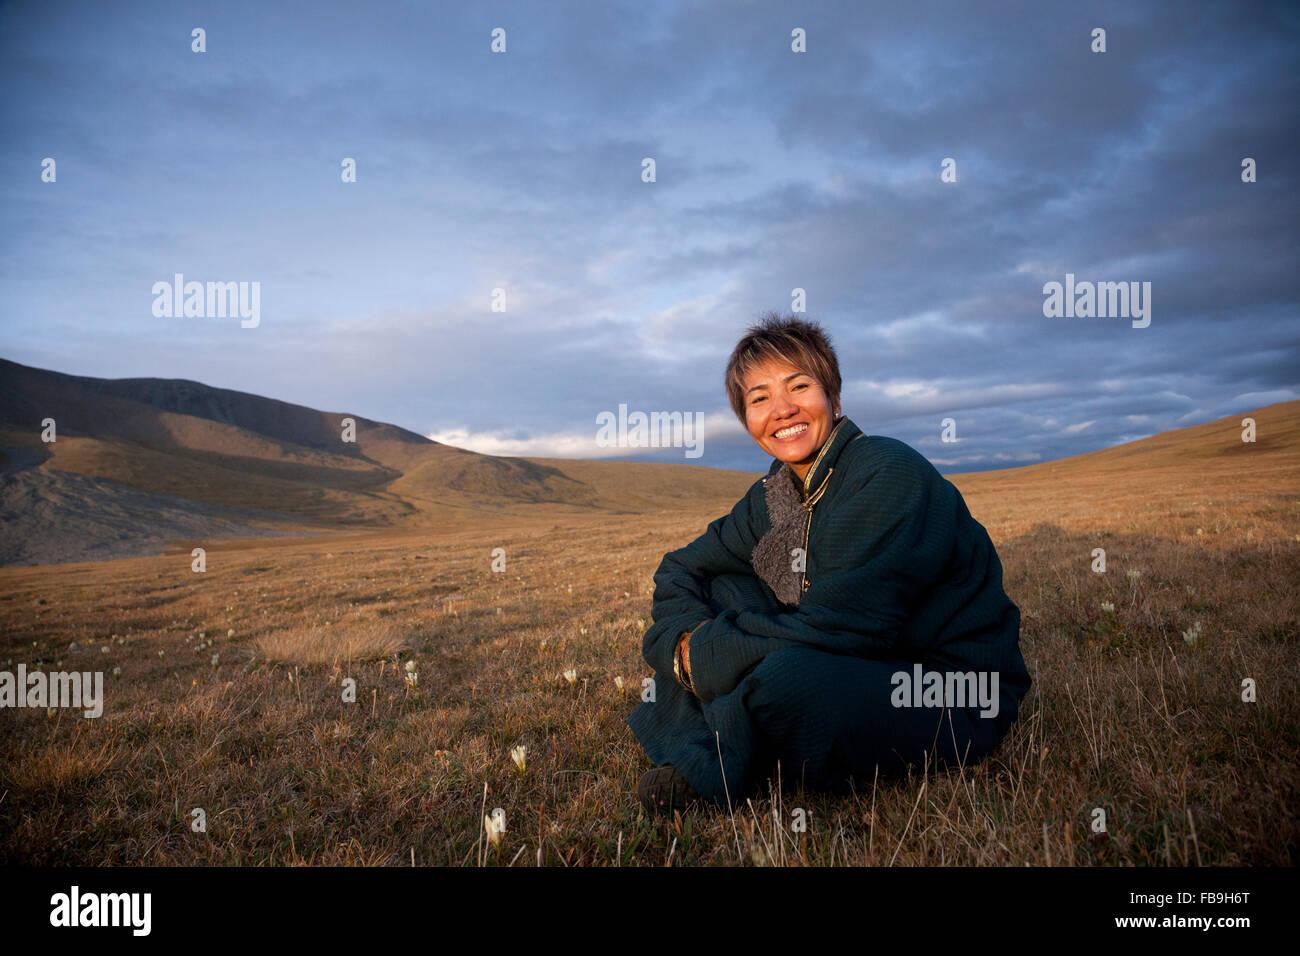 Tseren Enebish of Tseren Tours relaxing at sunset in the Kharkhiraa valley in far-western Mongolia. Stock Photo